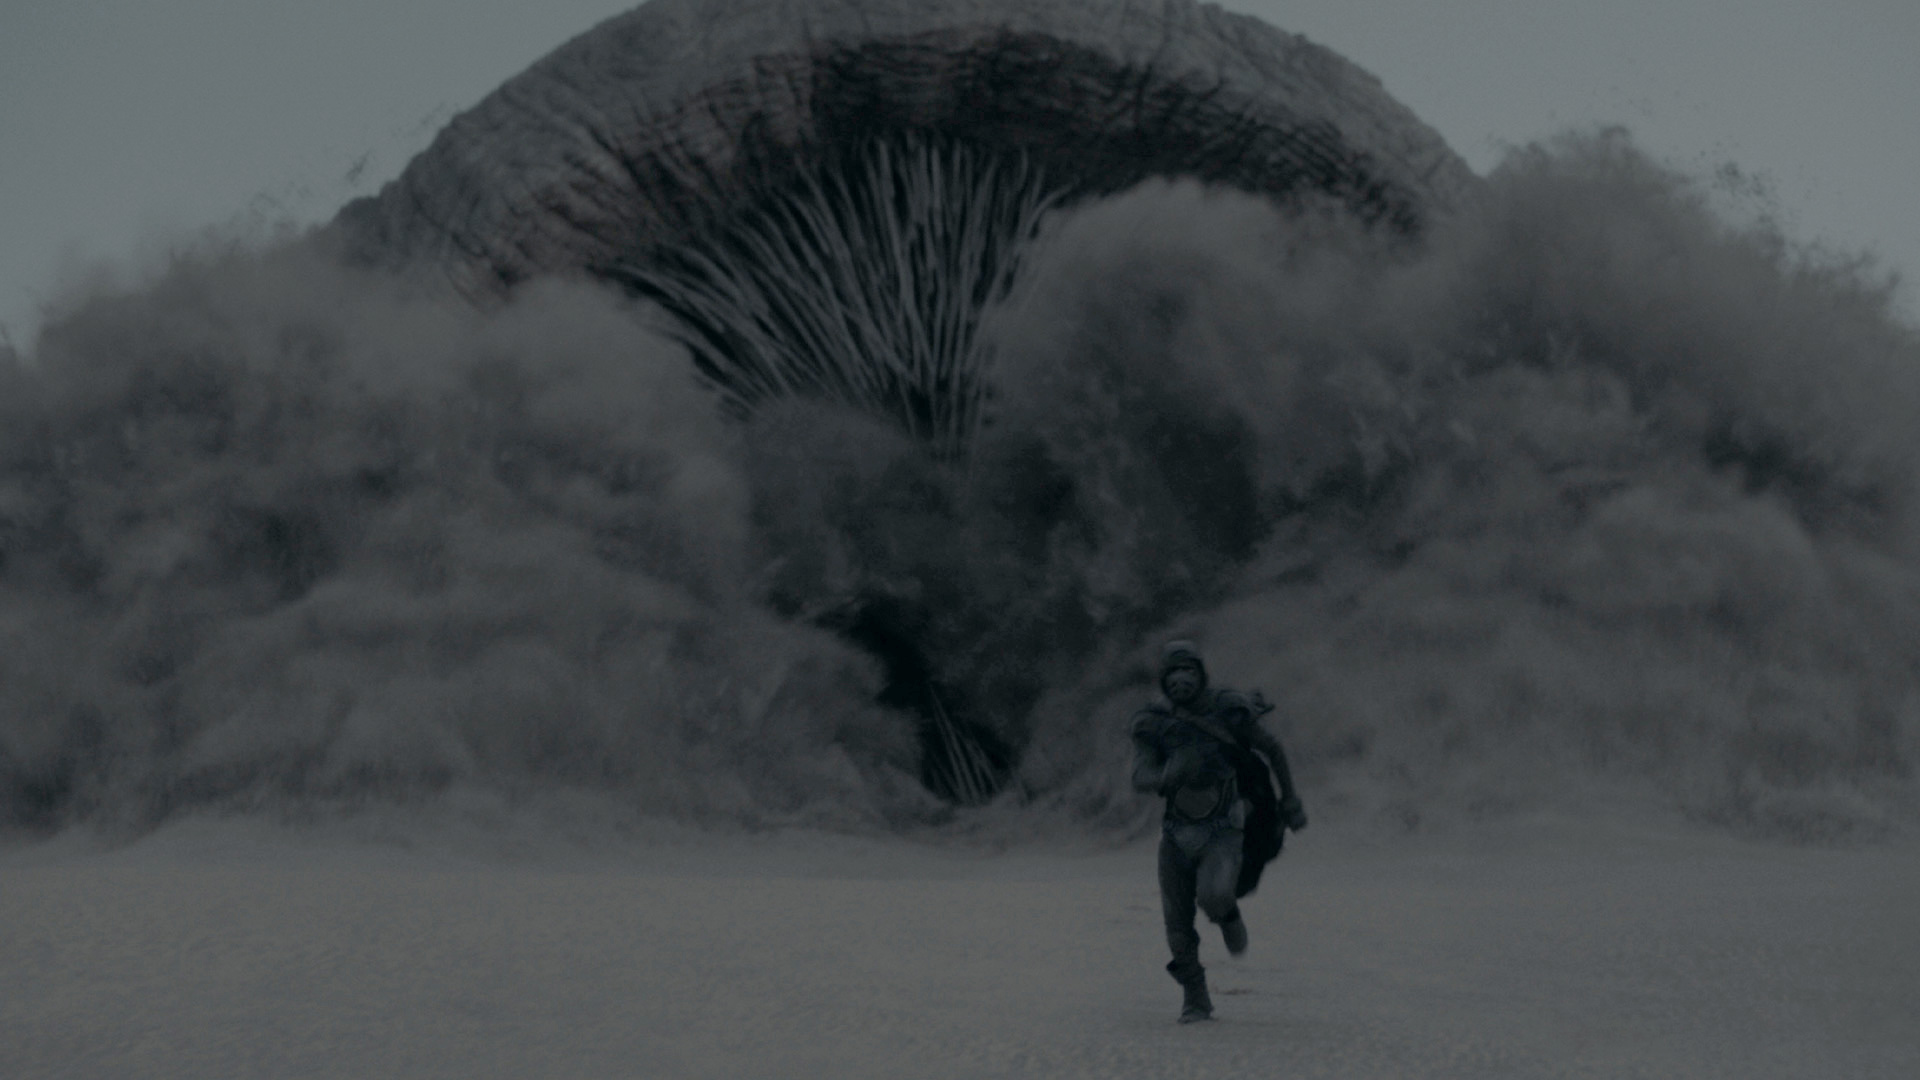 https://mindcraftstories.ro/images/2021/09/Mindcraftstories_Dune-Denis-Villeneuve-Timothee-Chalamet-Frank-herbert-Science-Fiction_03_Legendary-and-Warner-Bros.-Entertainment-Inc.jpg